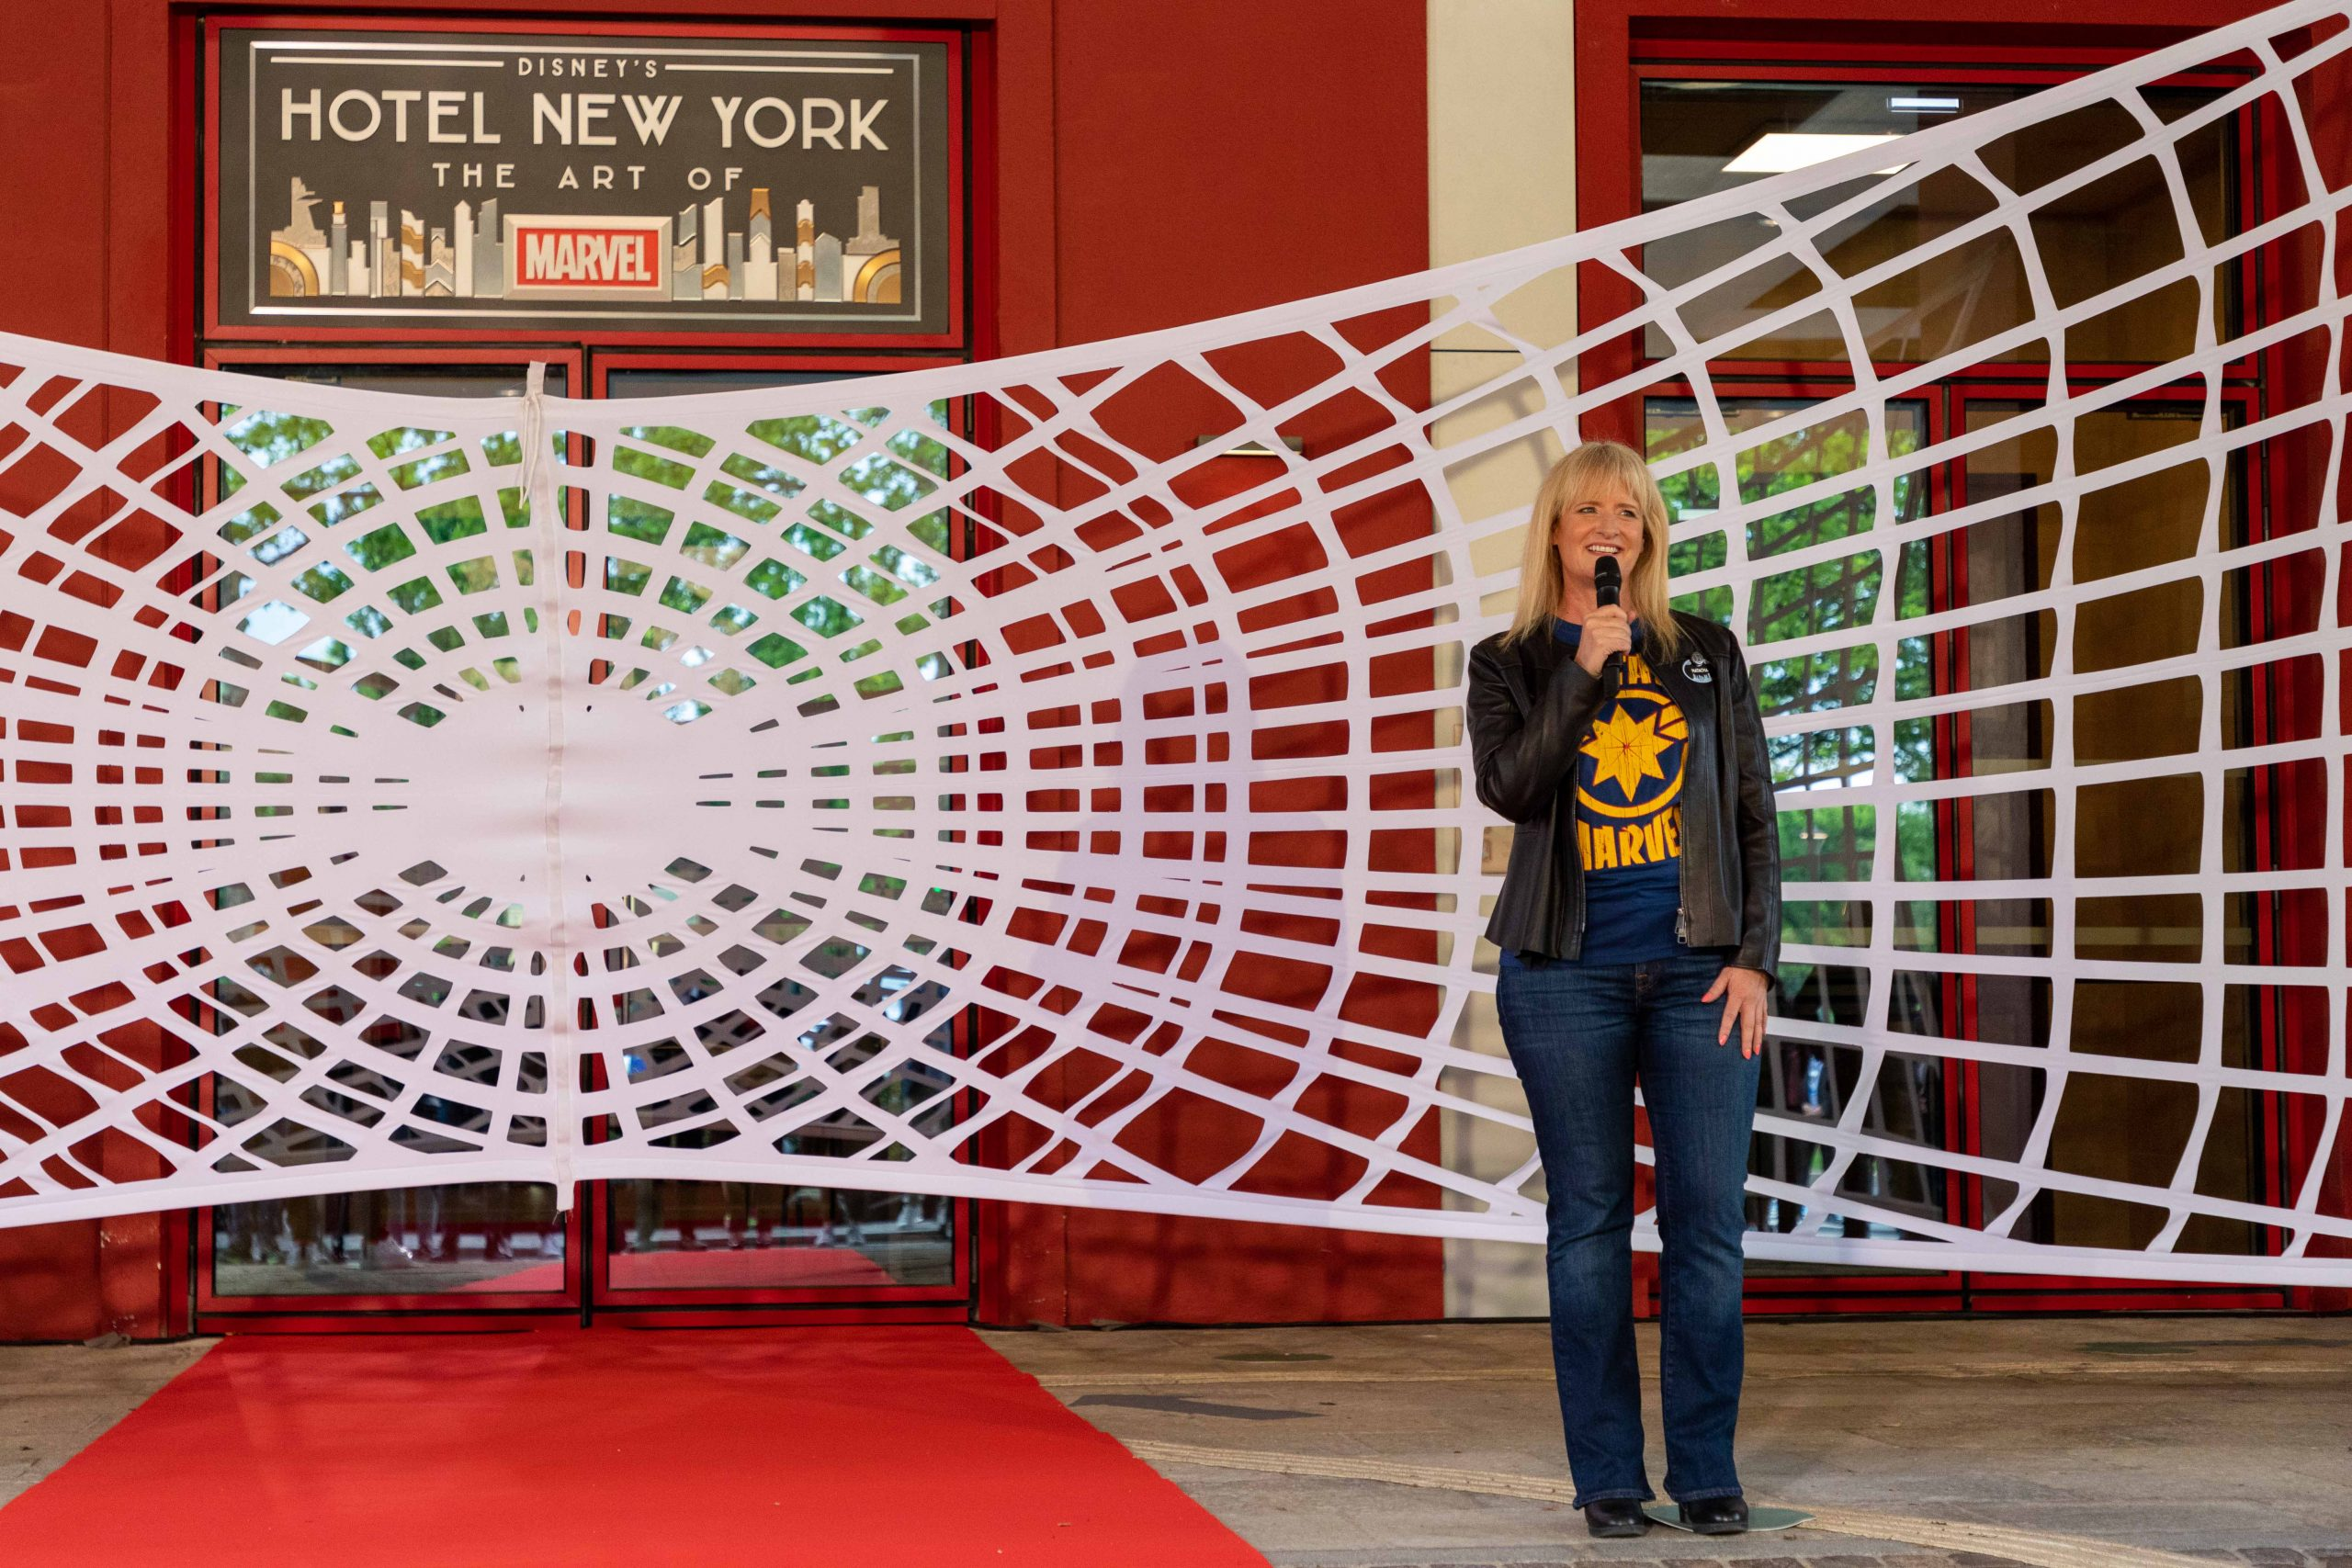 Disney's Hotel New York - The Art of Marvel - Pagina 5 Opening-Ceremony-1-scaled